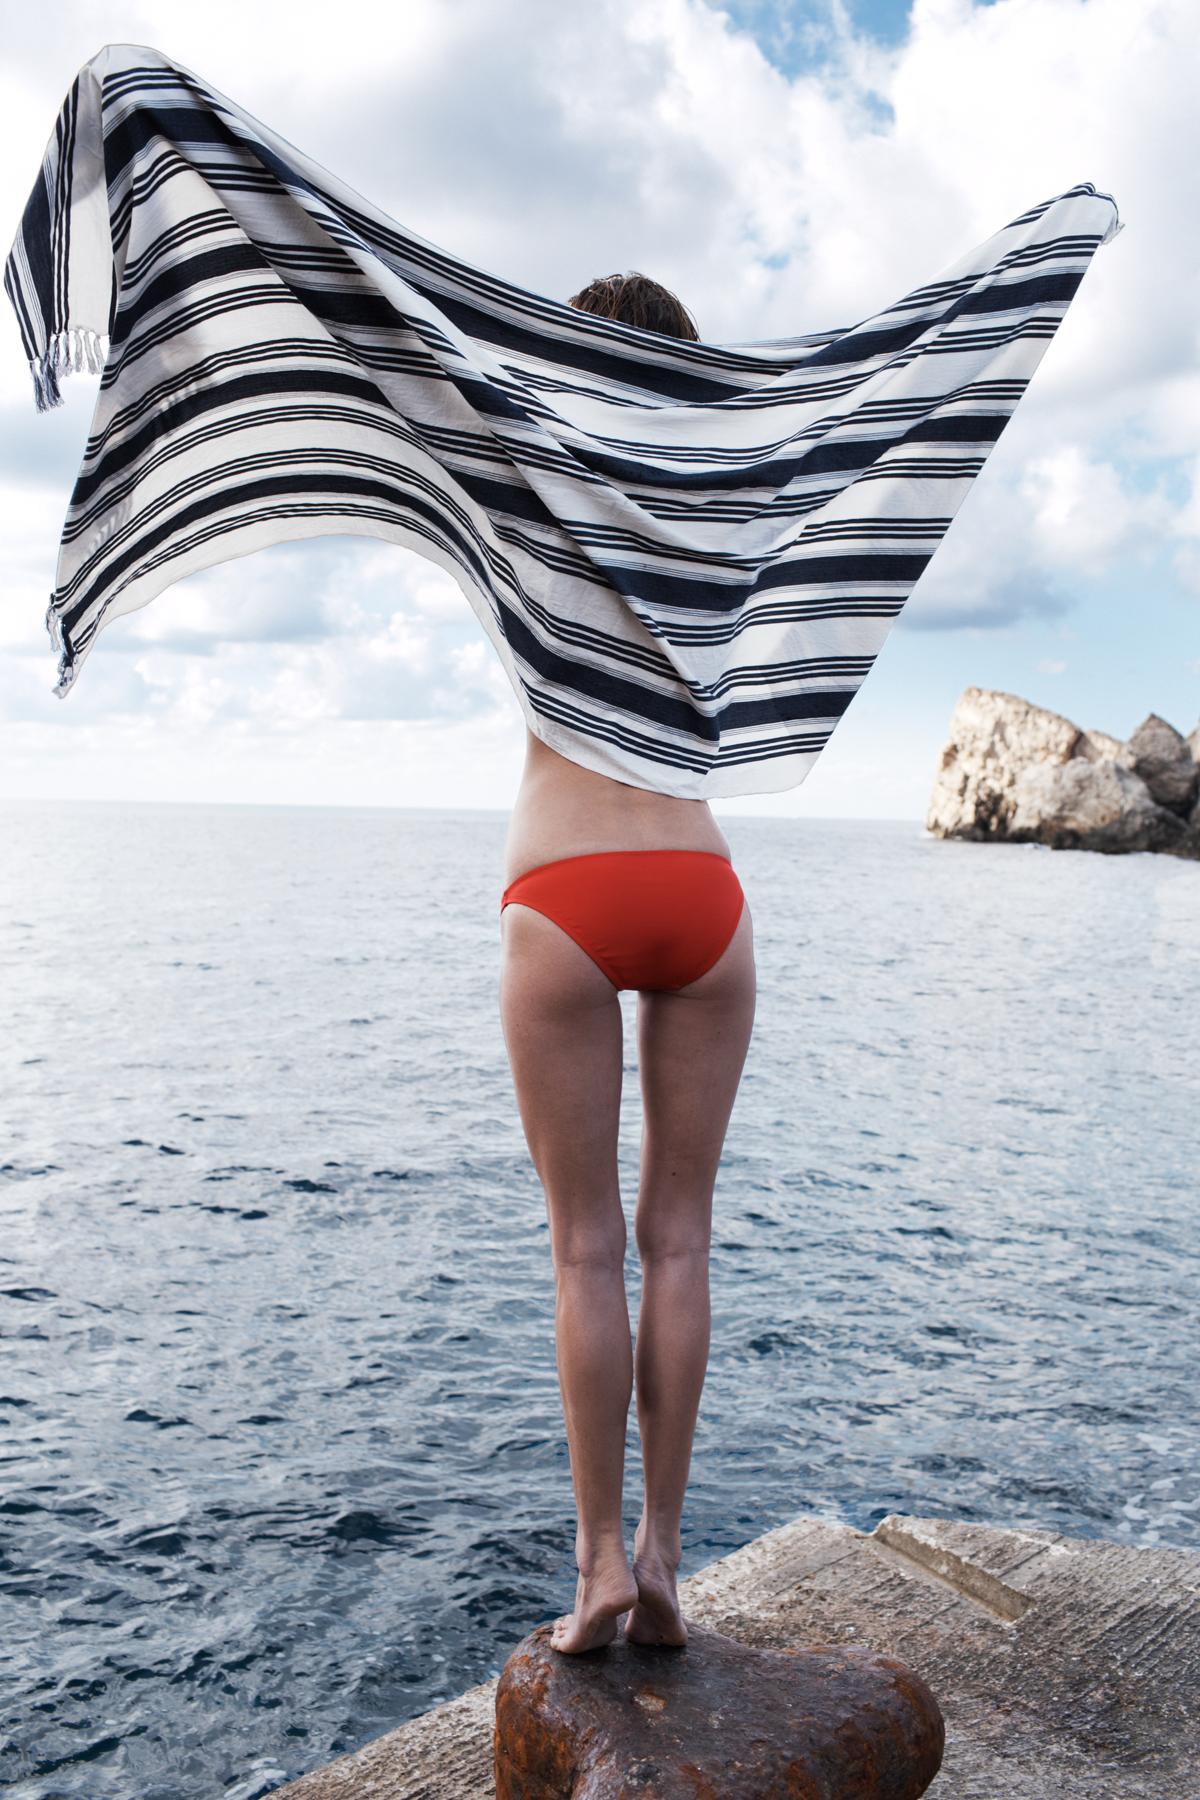 Madewell Awning stripe scarf worn with French-seam bikini top + hipster bikini bottom.